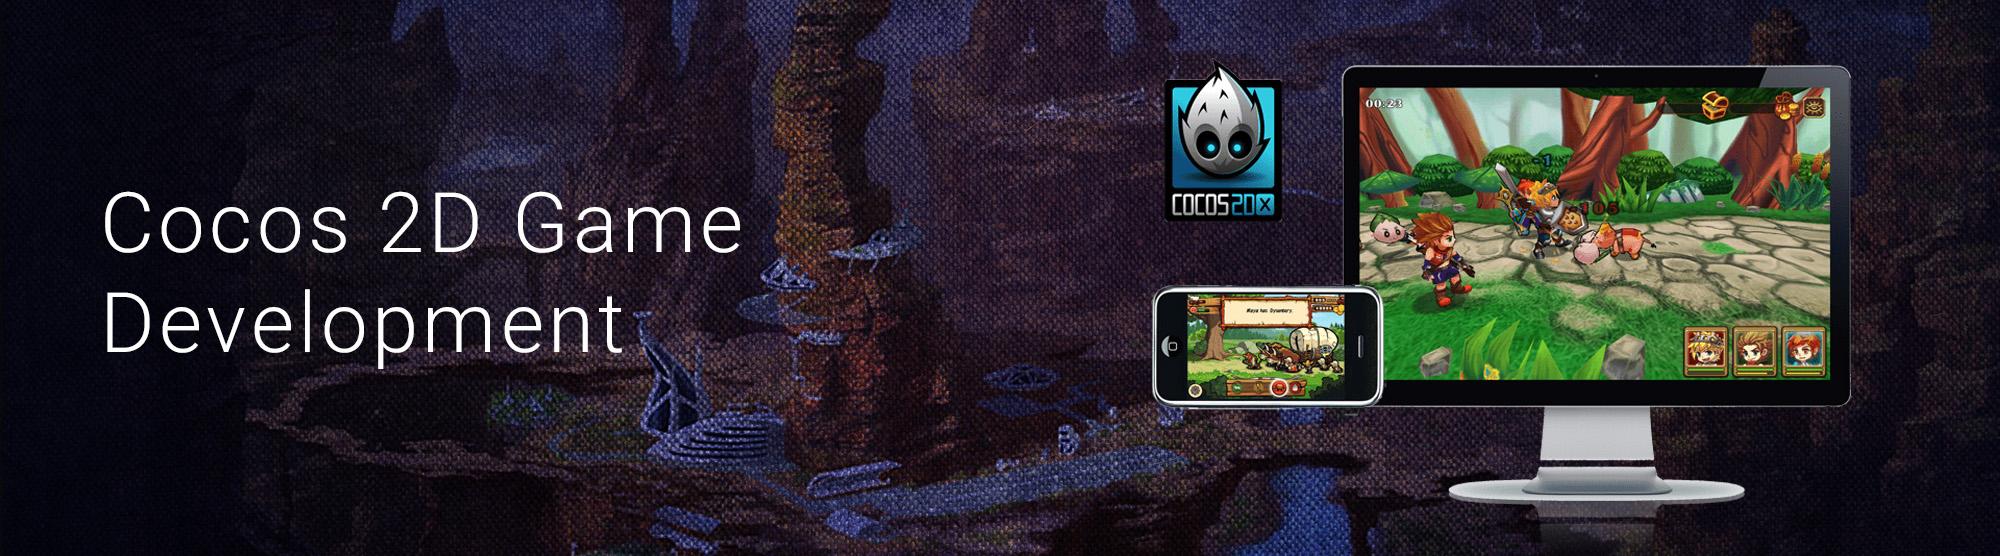 cocos 2d game development